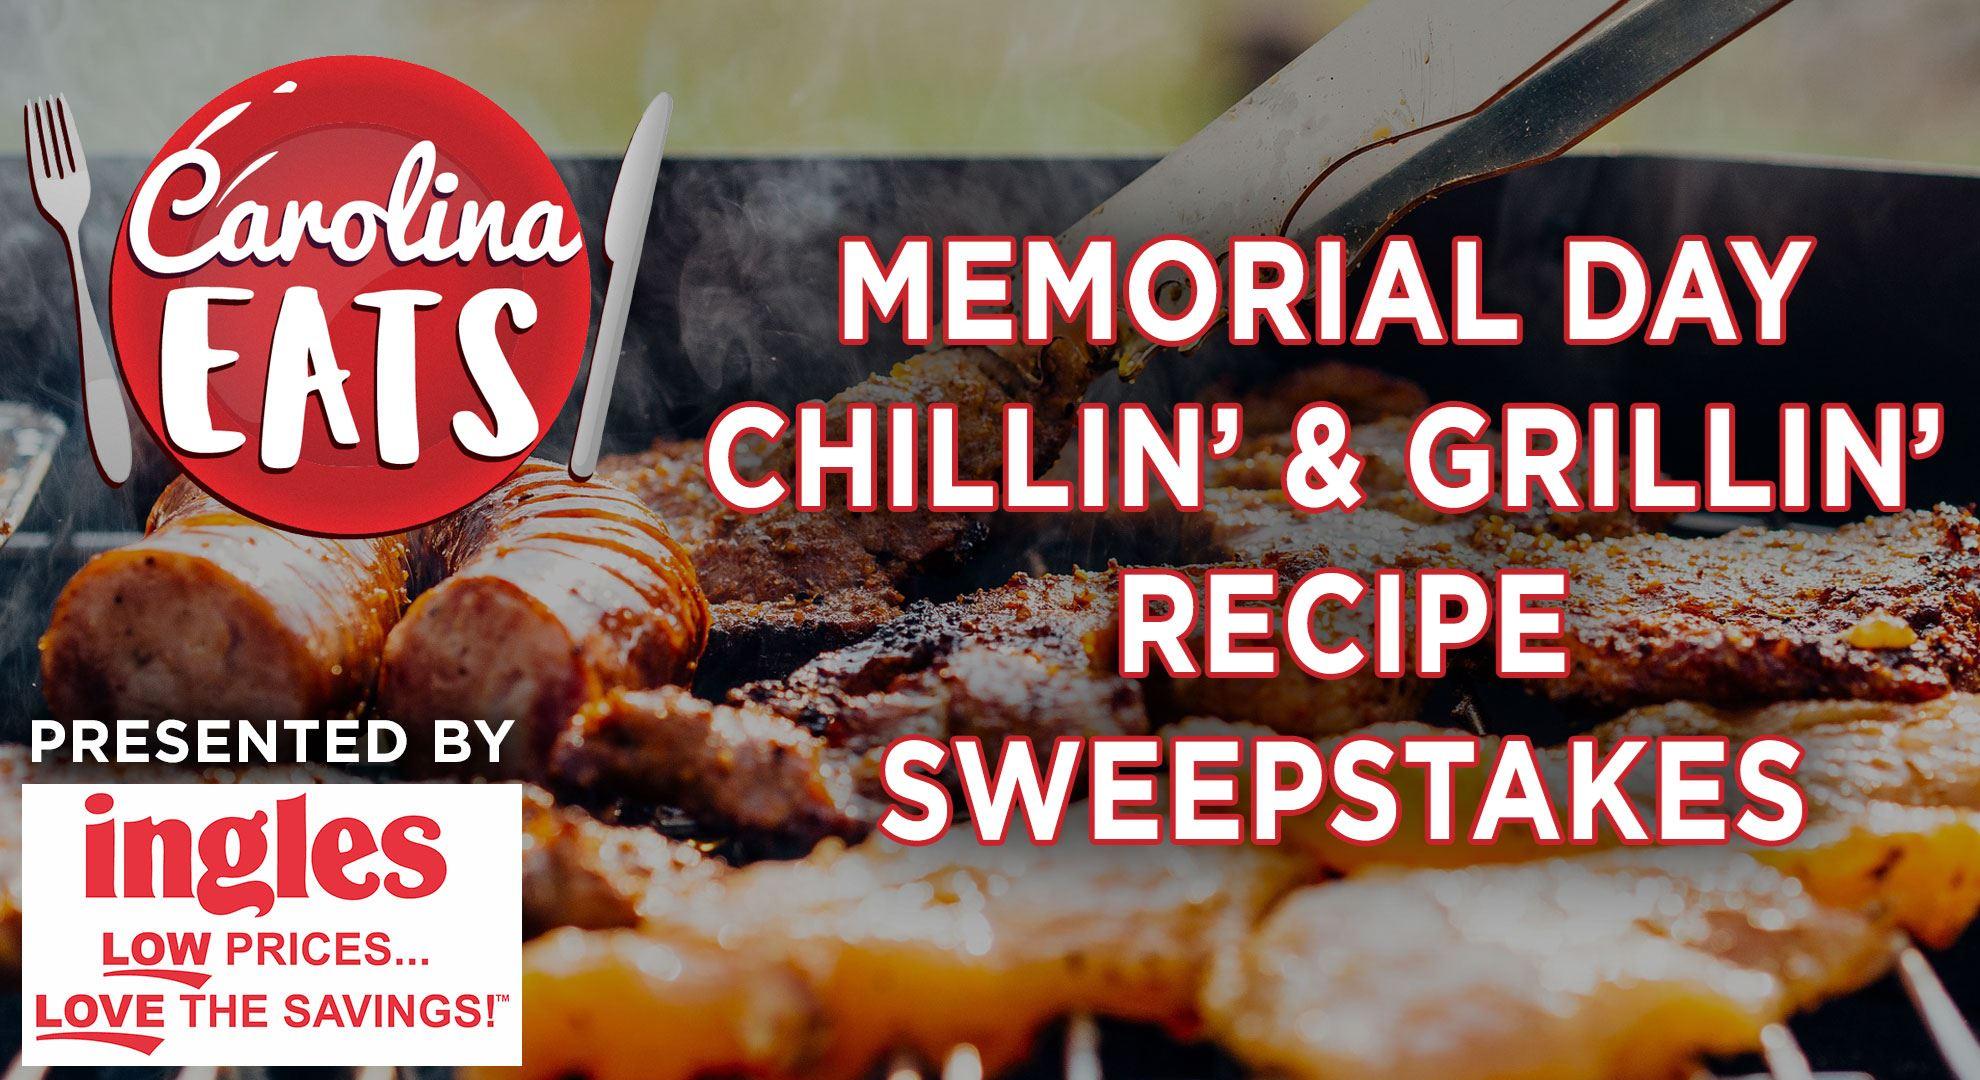 Carolina Eats Memorial Day Recipe Sweepstakes